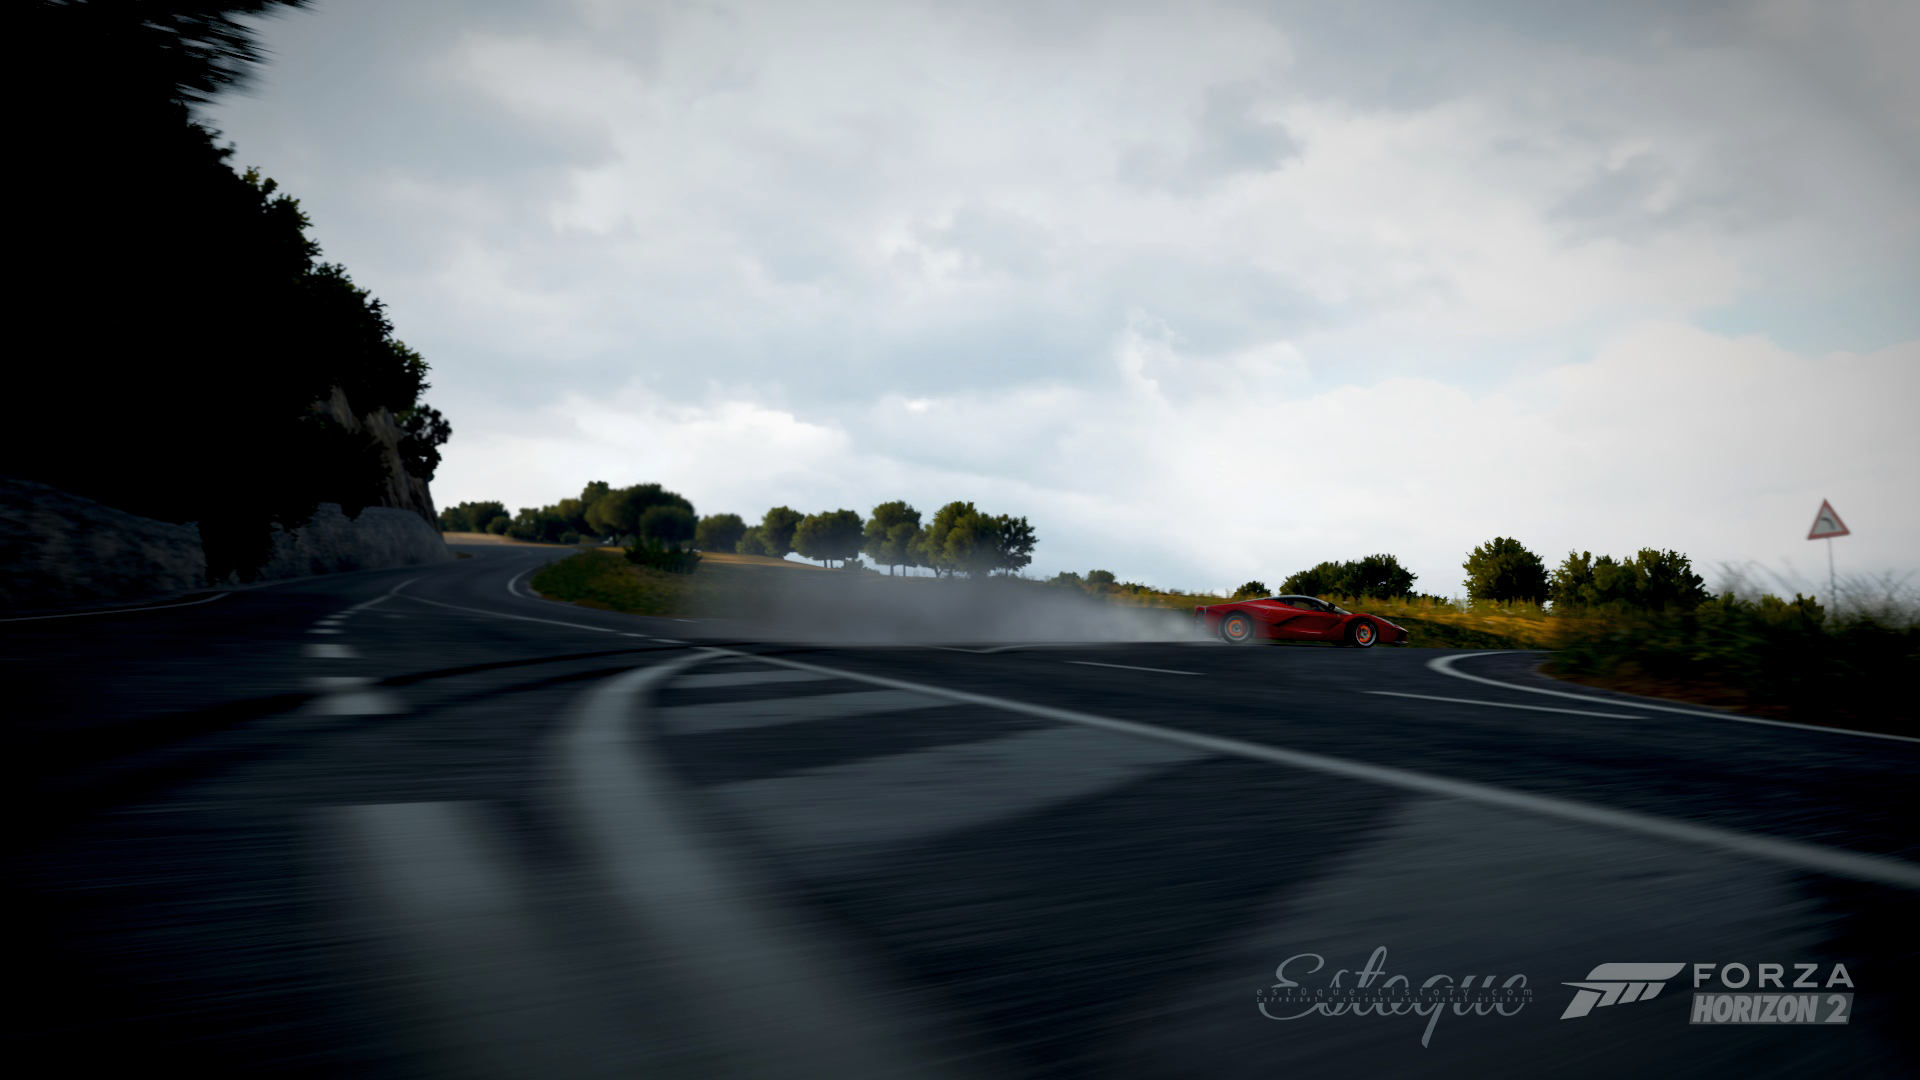 Drifting Laferrari